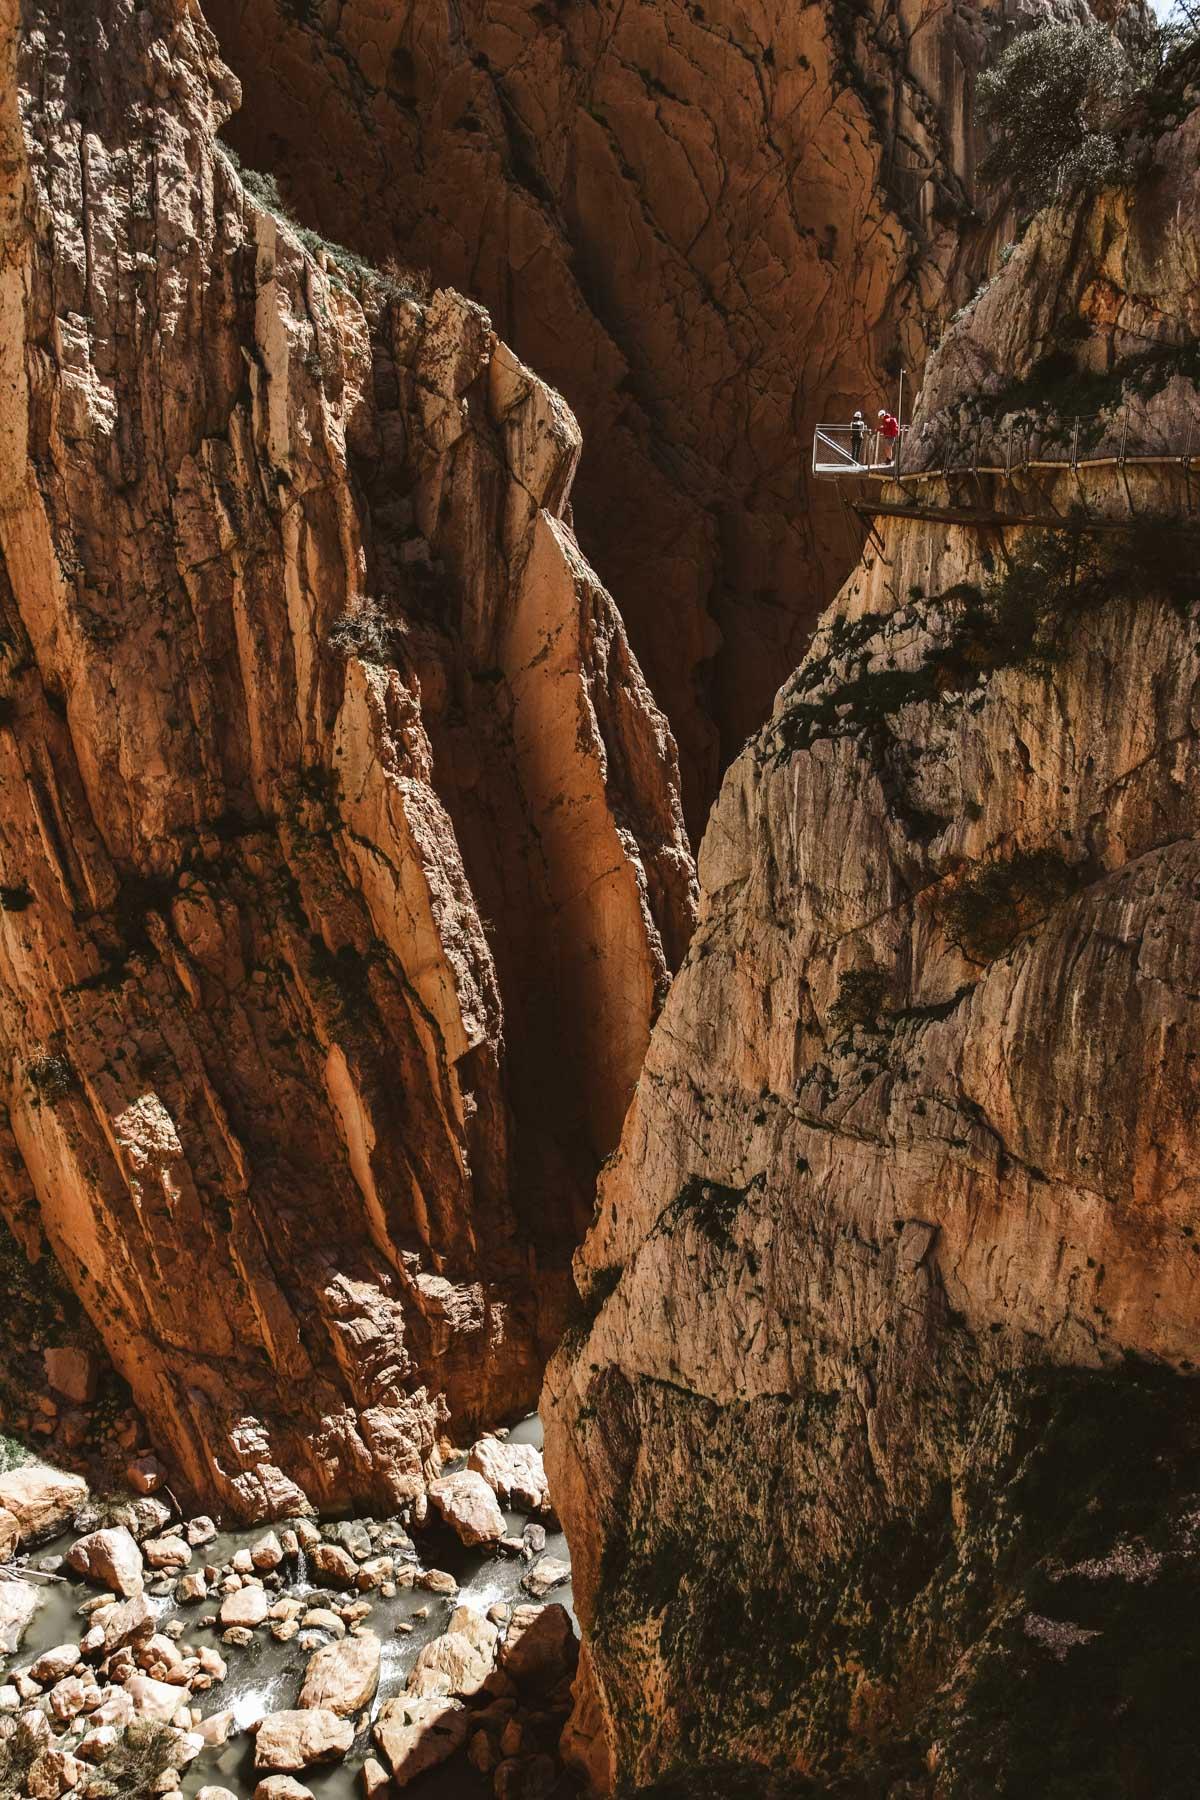 Vue vertigineuse sur les falaises de Caminito del Rey, Andalousie